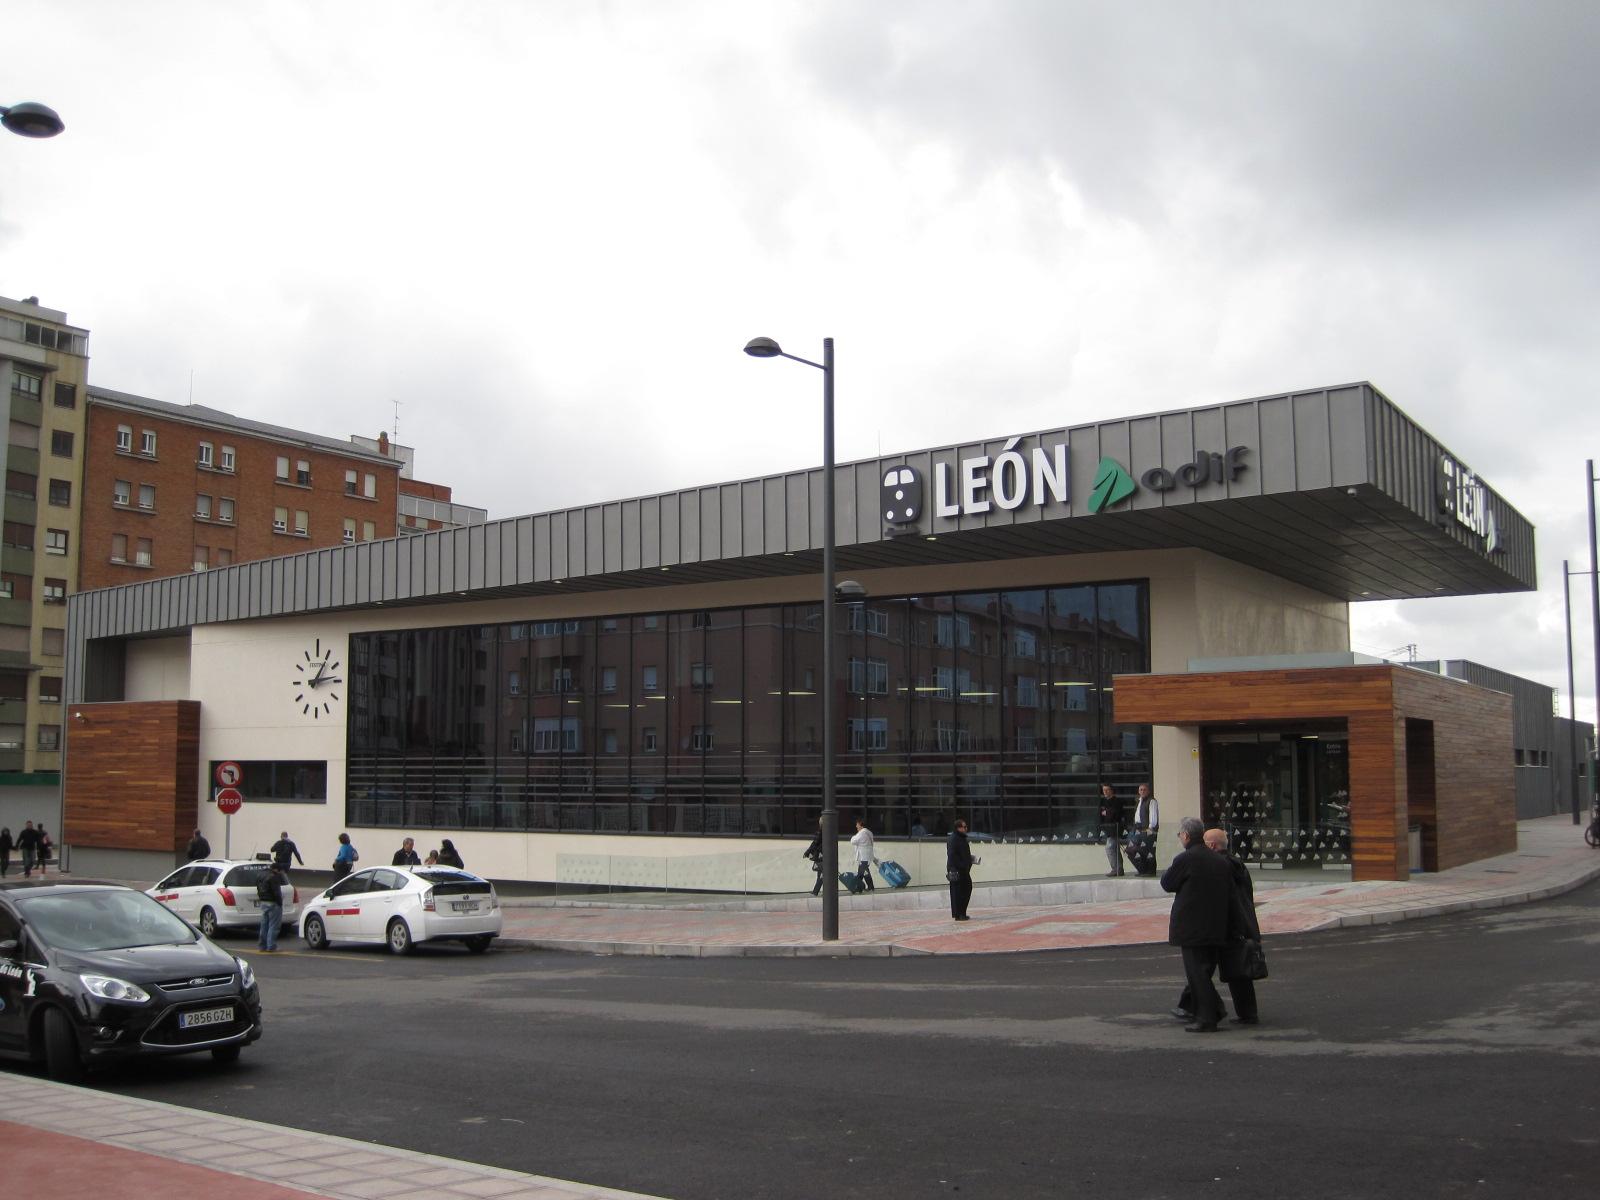 Estacion Tren Leon Mapa.Estacion De Leon Wikipedia La Enciclopedia Libre